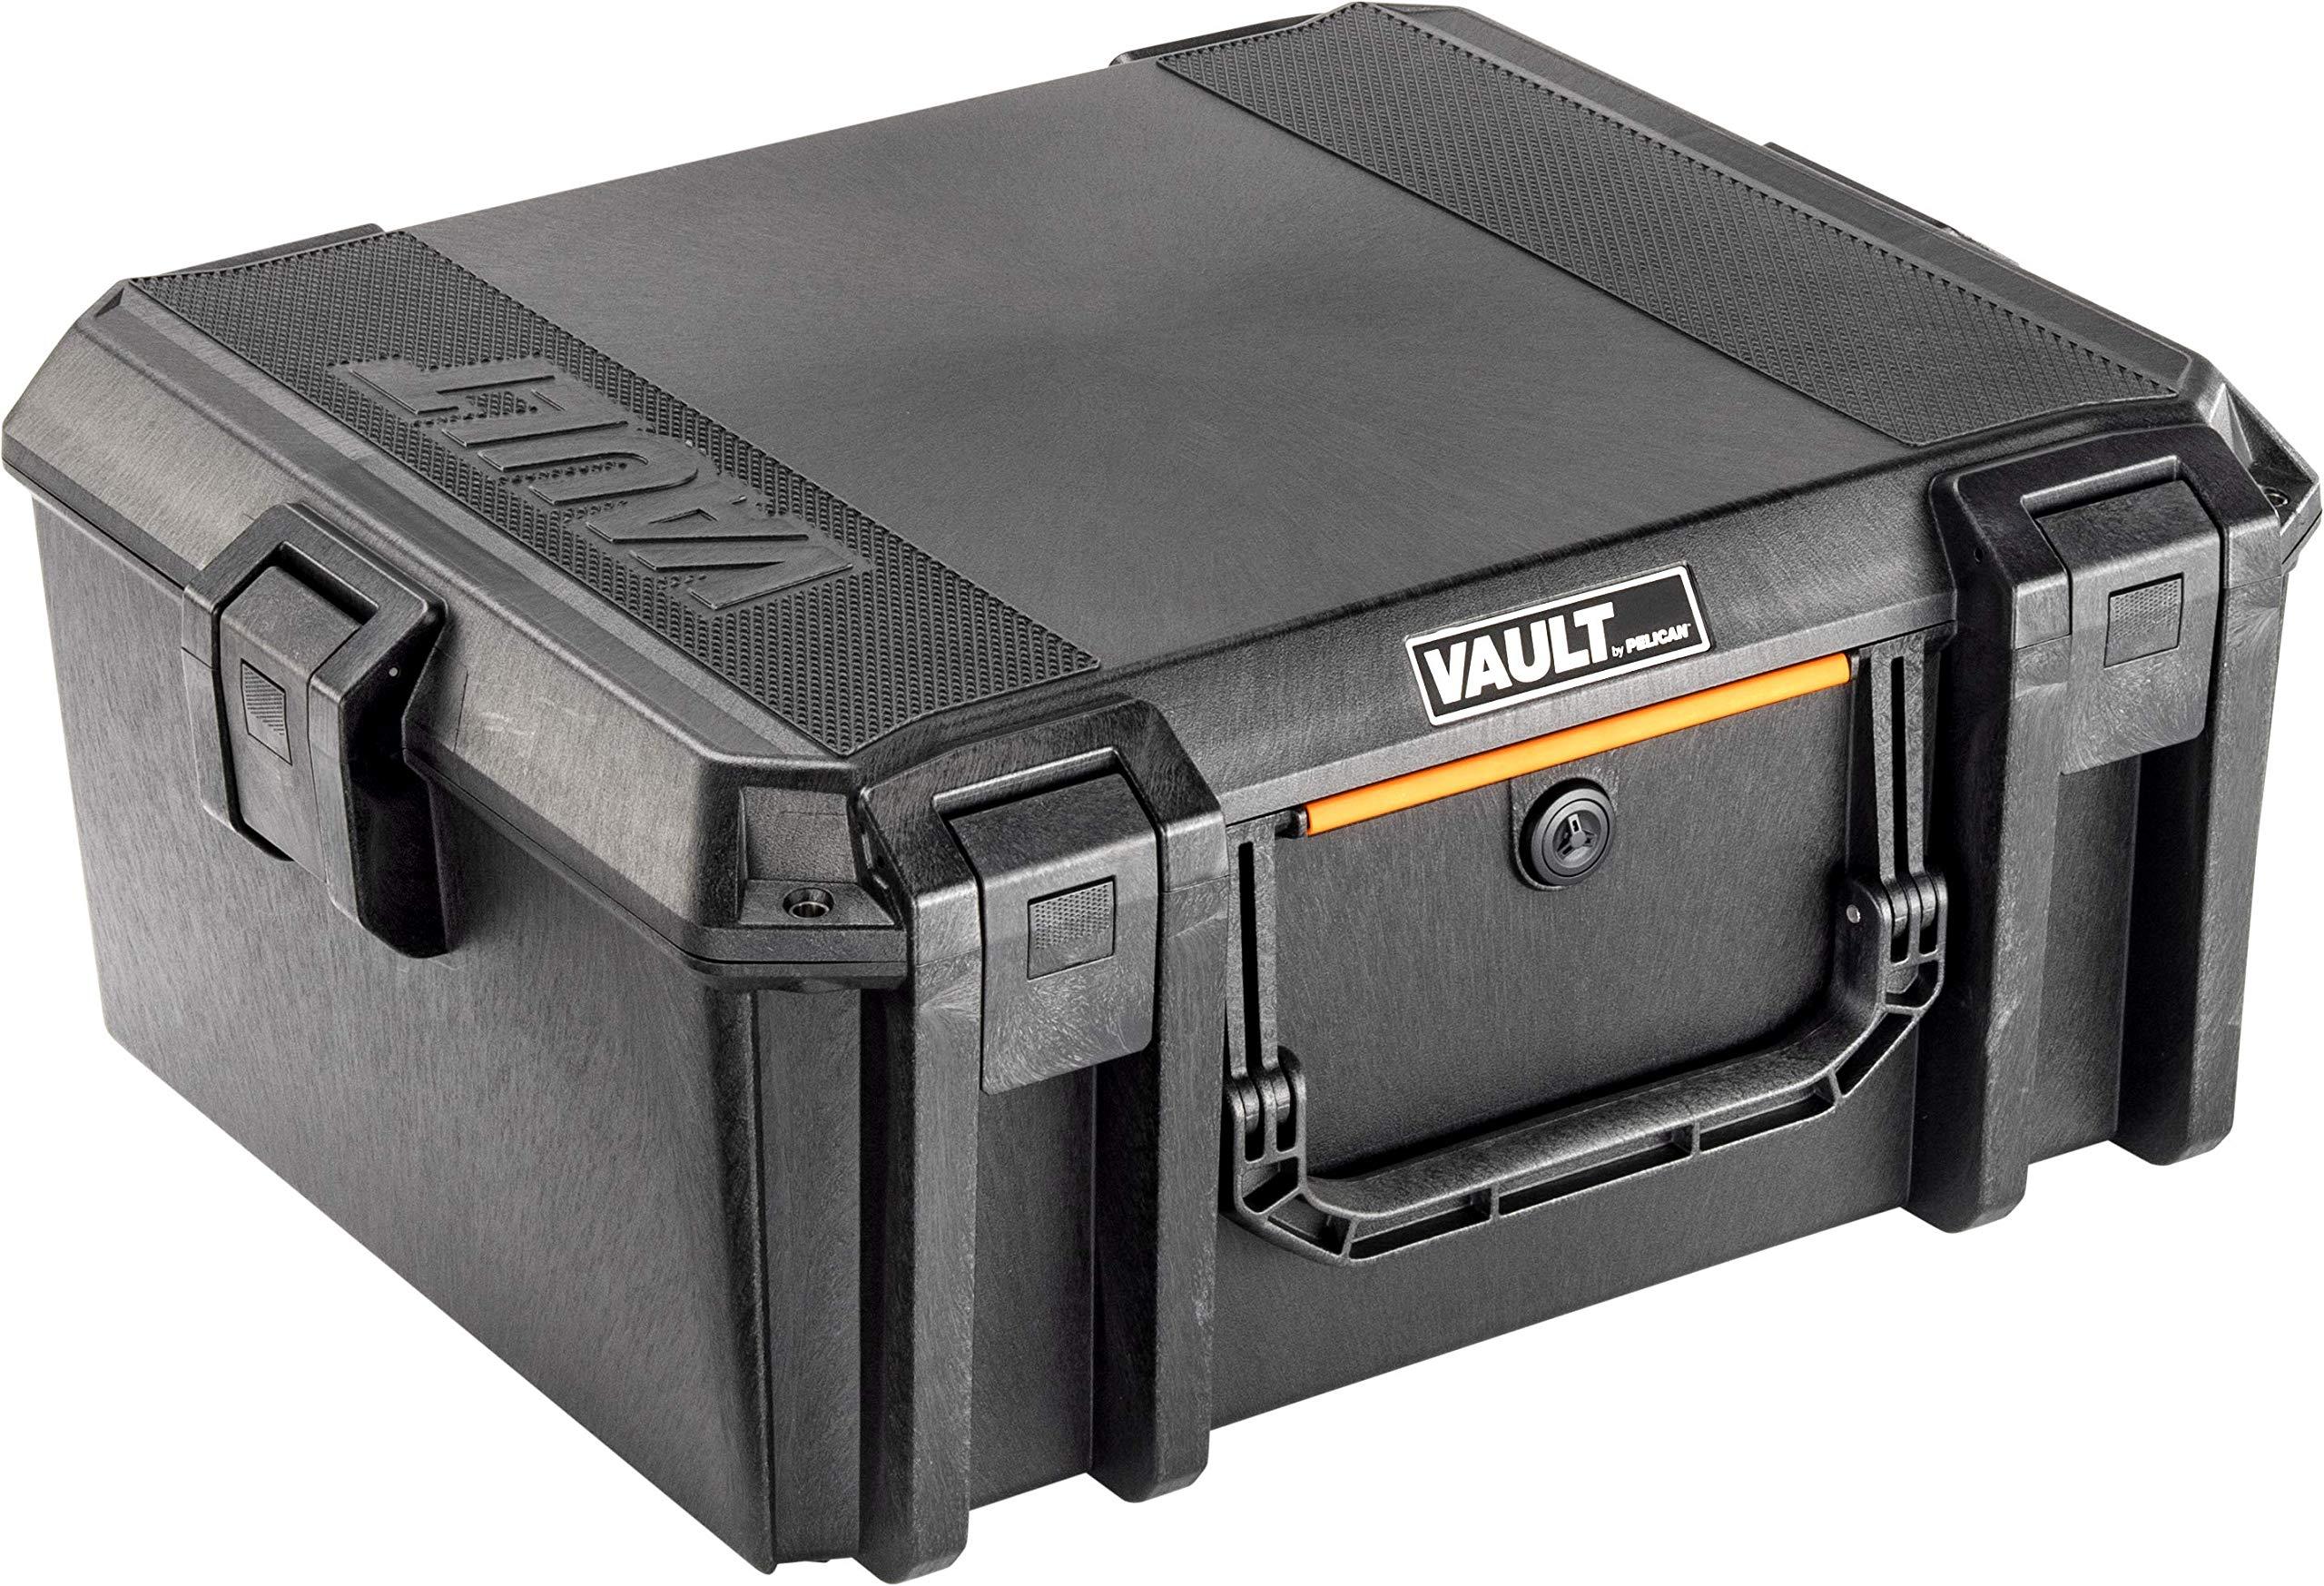 Vault V600 Pistol Case with Foam - by Pelican (Black) by Pelican